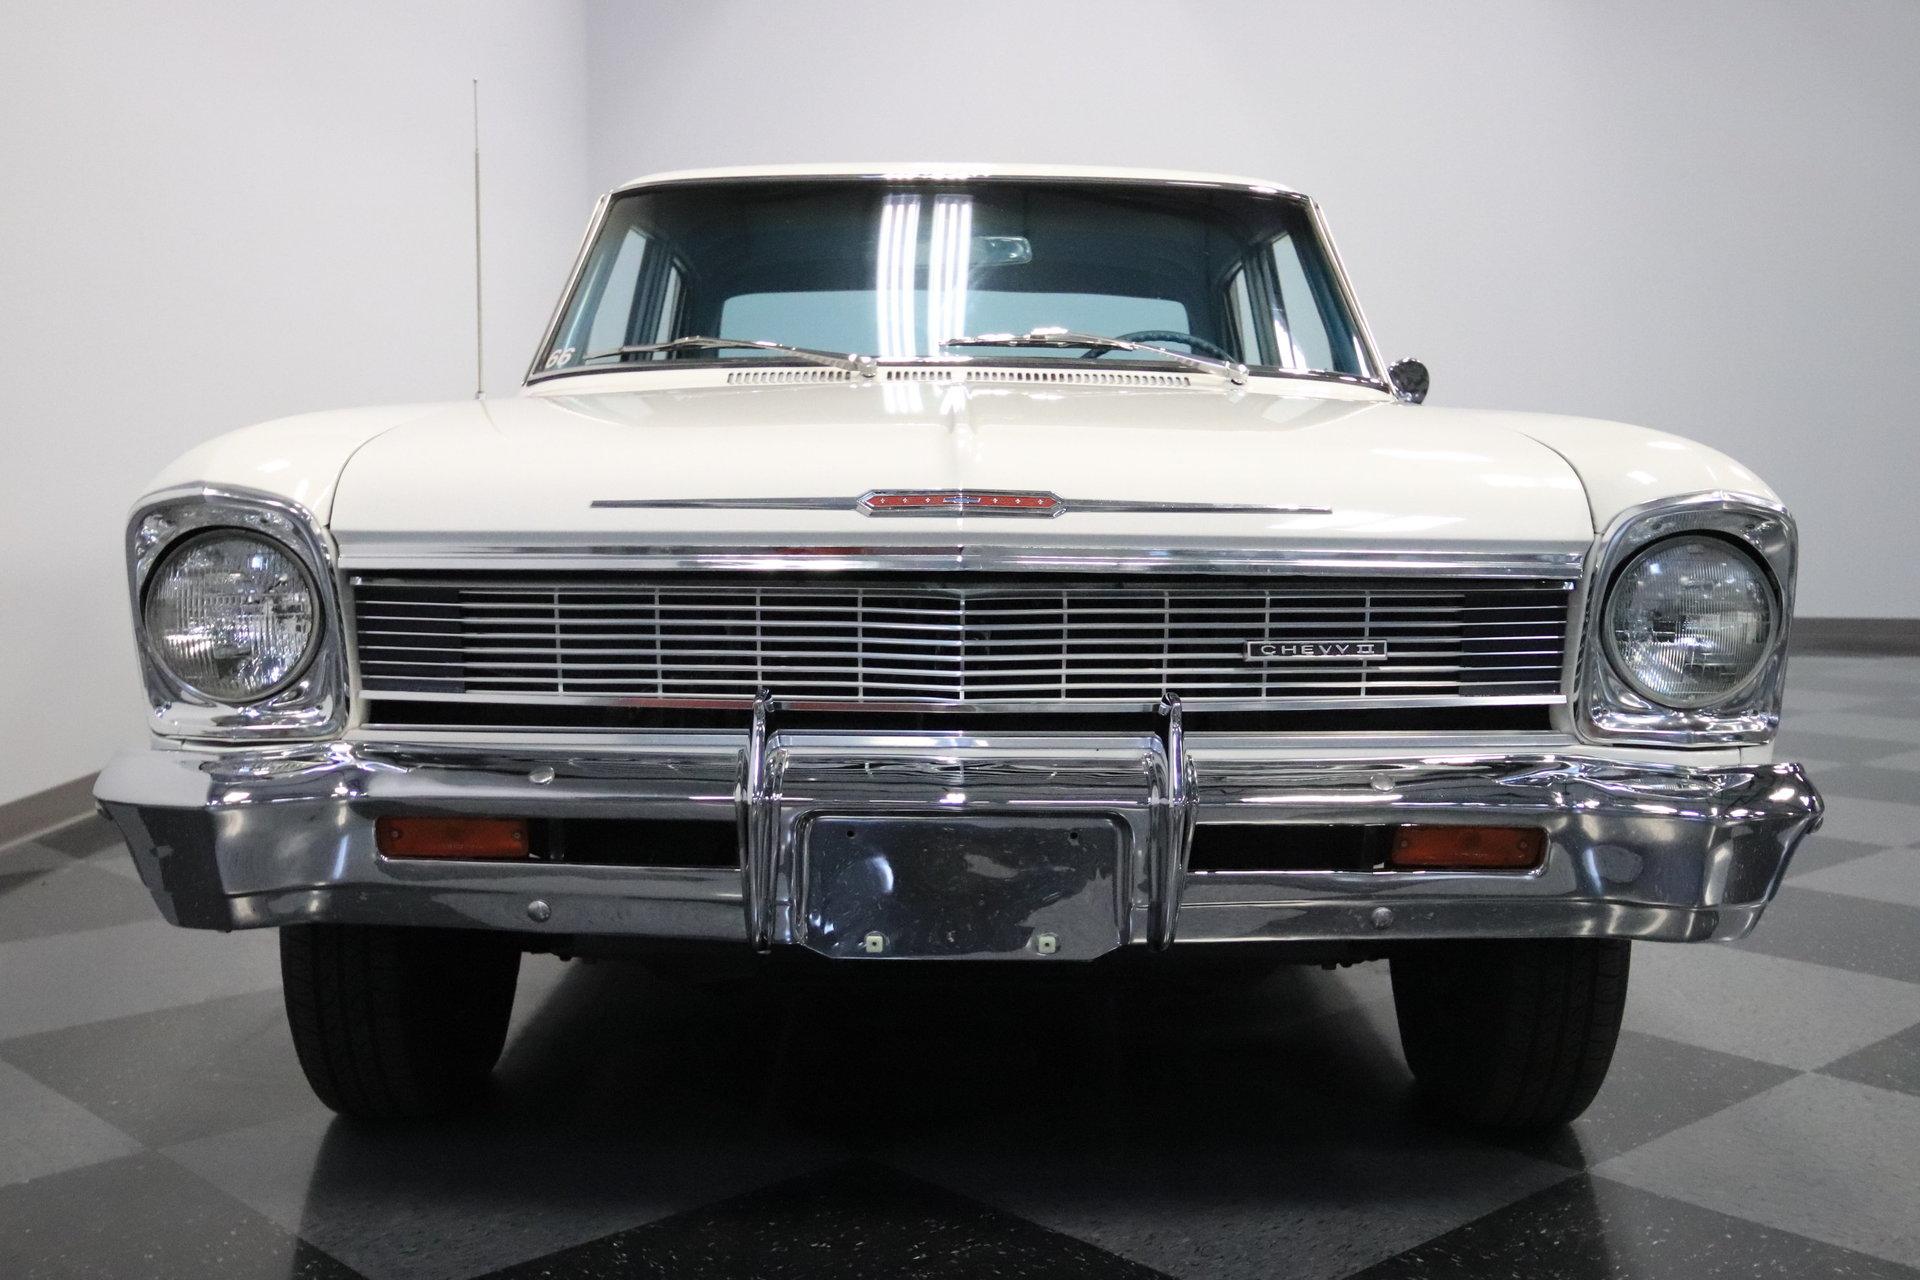 1966 Chevrolet Nova Streetside Classics The Nations Trusted Chevy Ii Show More Photos